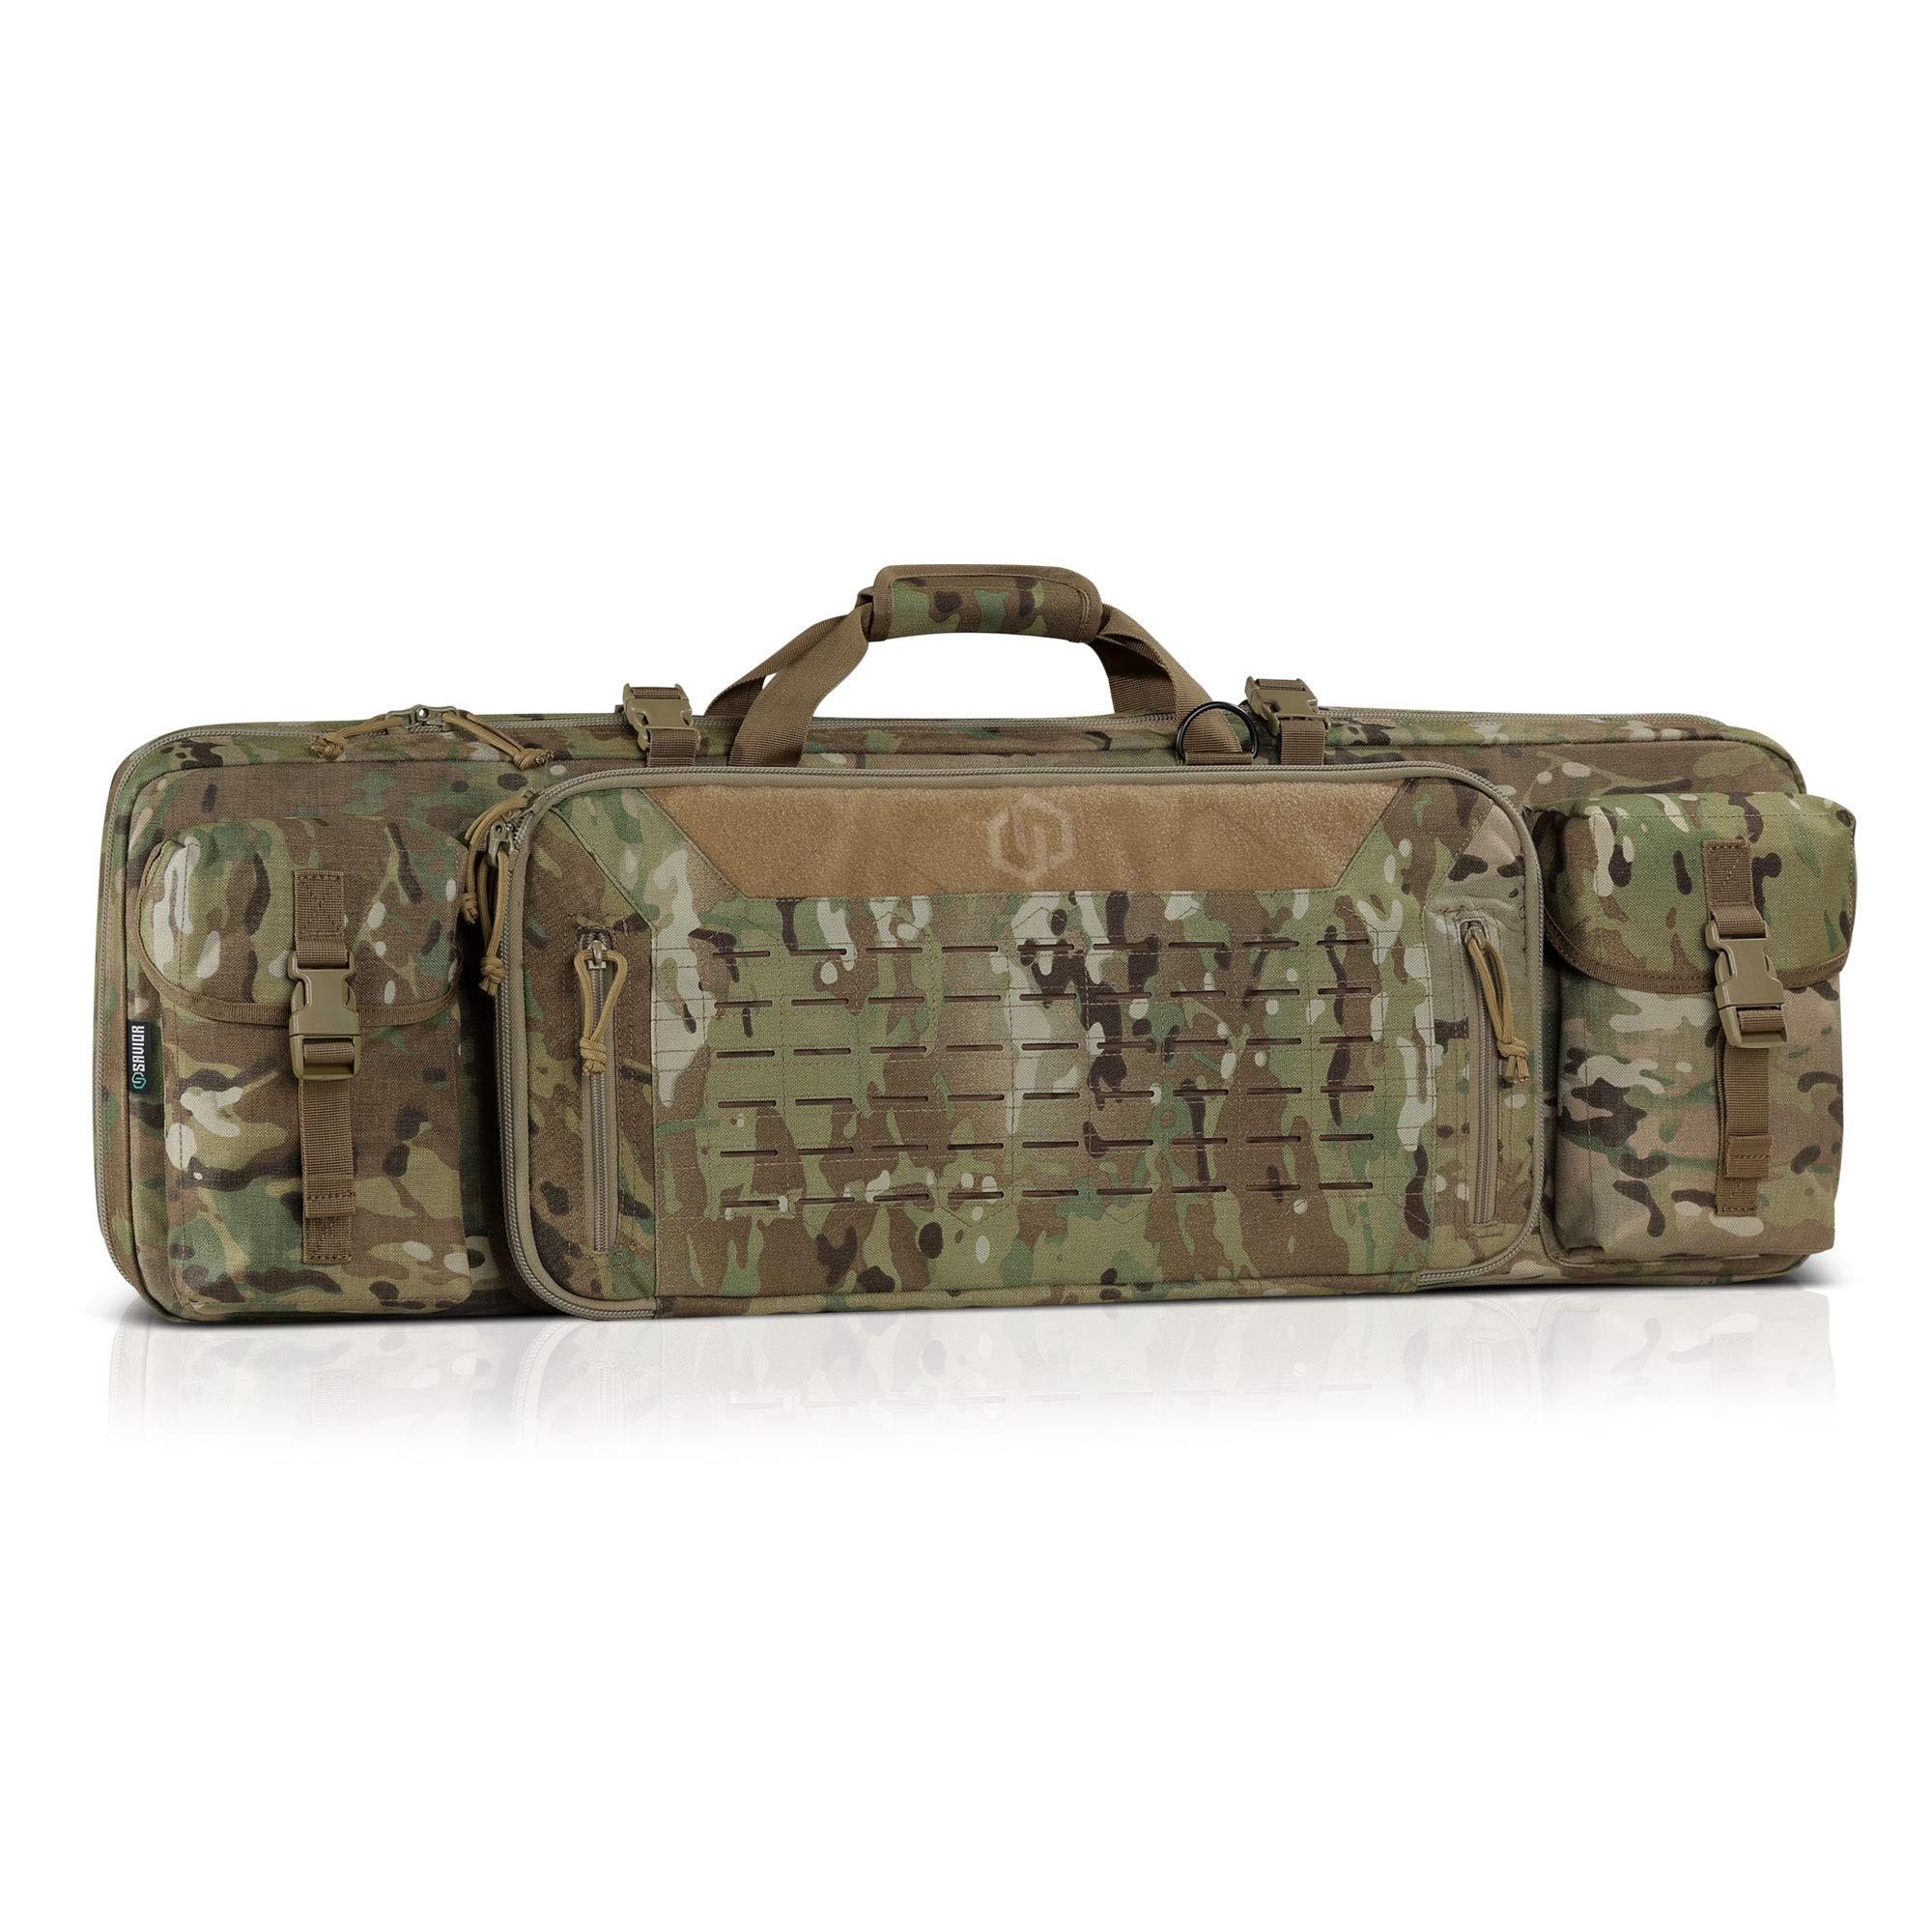 Savior Equipment 36'' Urban Warfare Multicam Original Tactical Double Carbine Long Rifle Bag Firearm Gun Case w/Removable Backpack Strap - 1000D Cordura Nylon Fabric, UTX Buckles, YKK Zippers by Savior Equipment